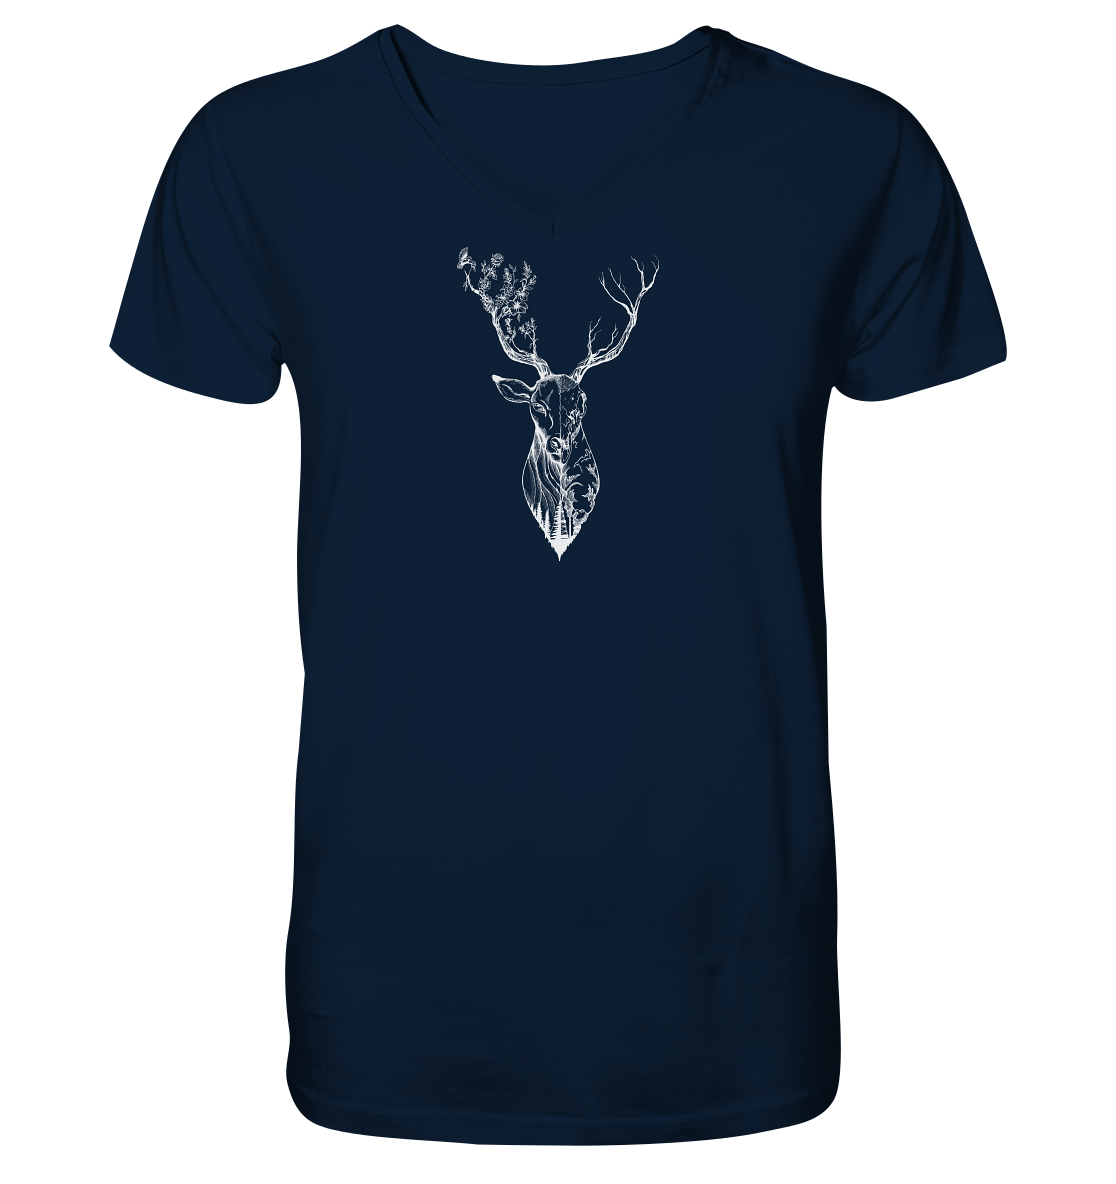 front-mens-organic-v-neck-shirt-0e2035-1116x-6.png